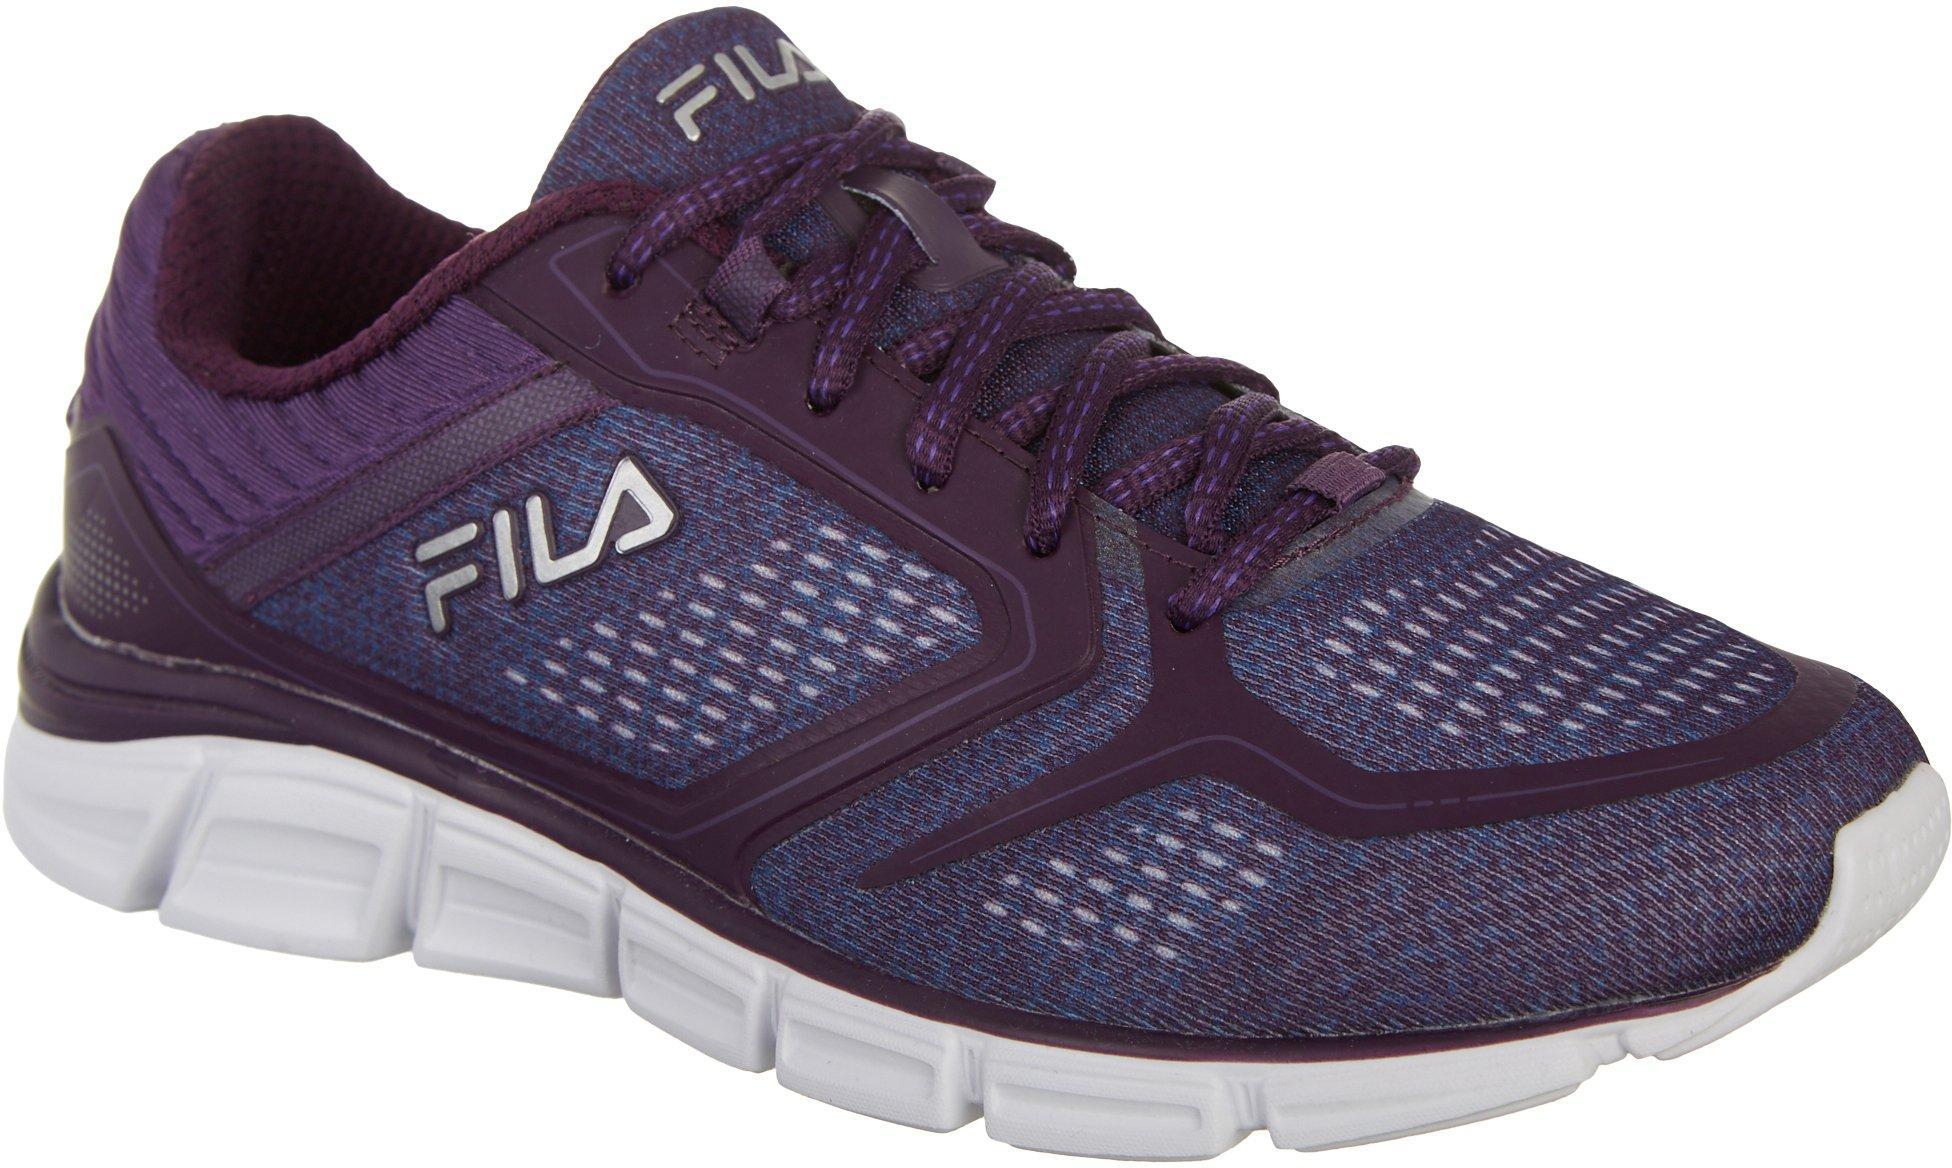 Fila Running Shoes Bealls Florida  Bealls Florida